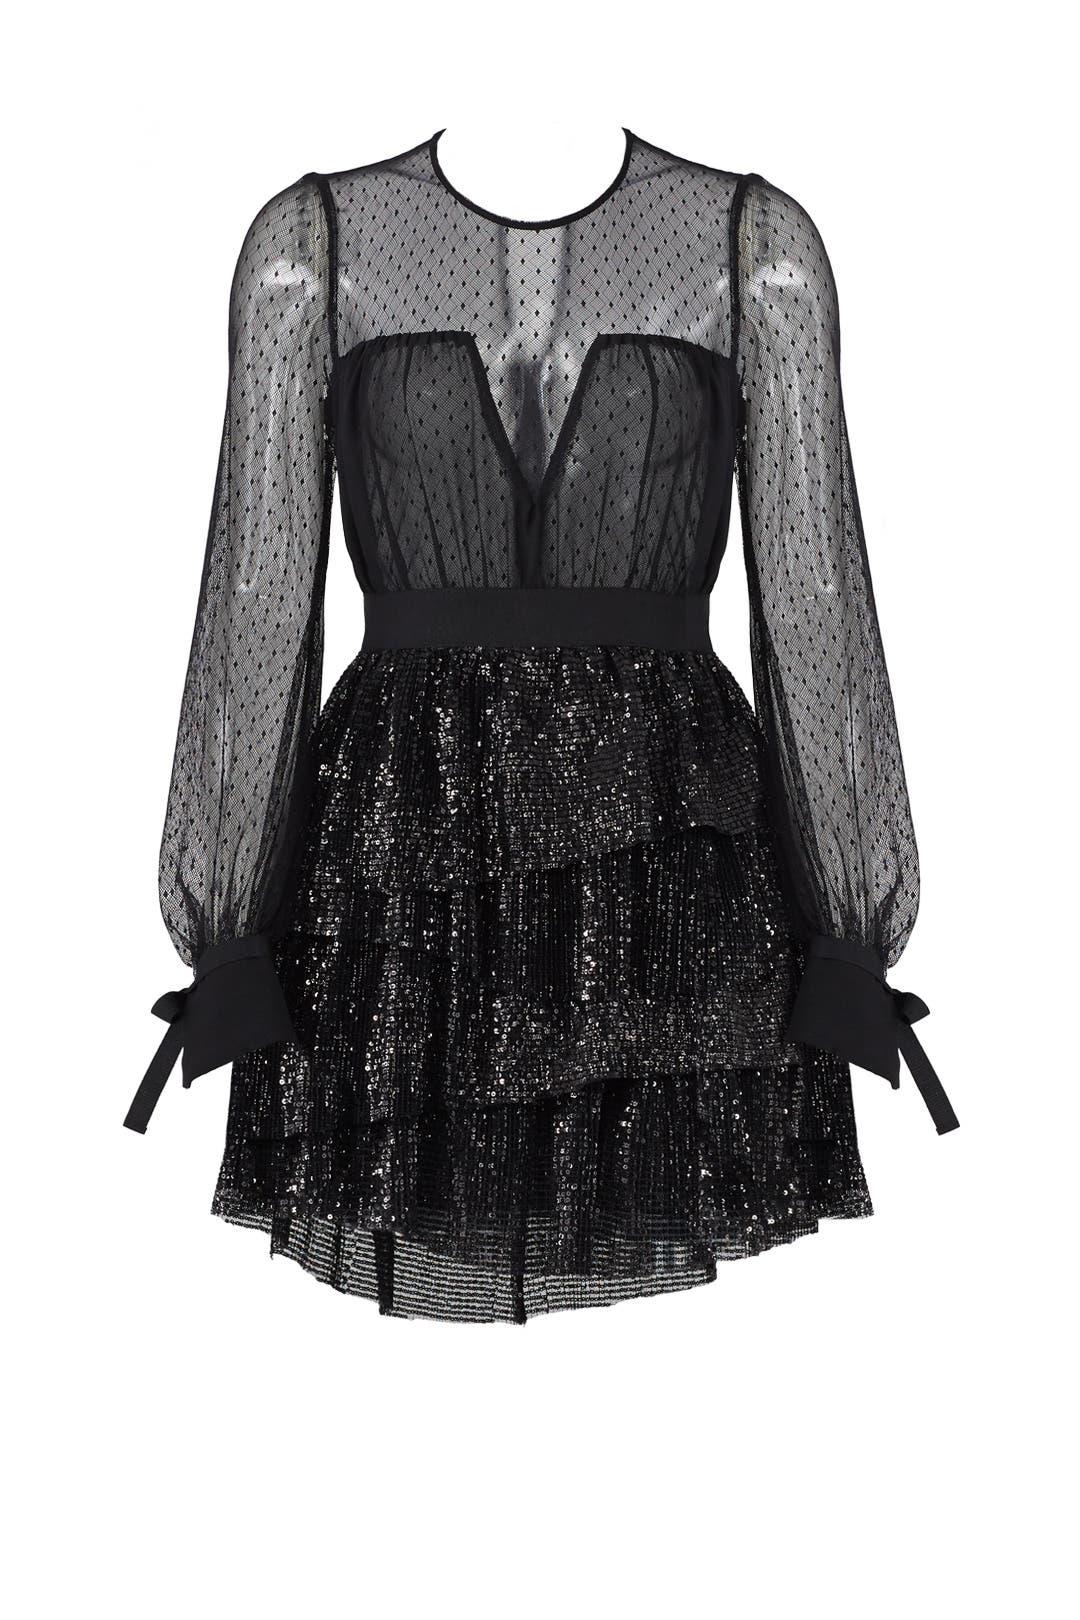 Mesh Sequin Dress by Christian Pellizzari